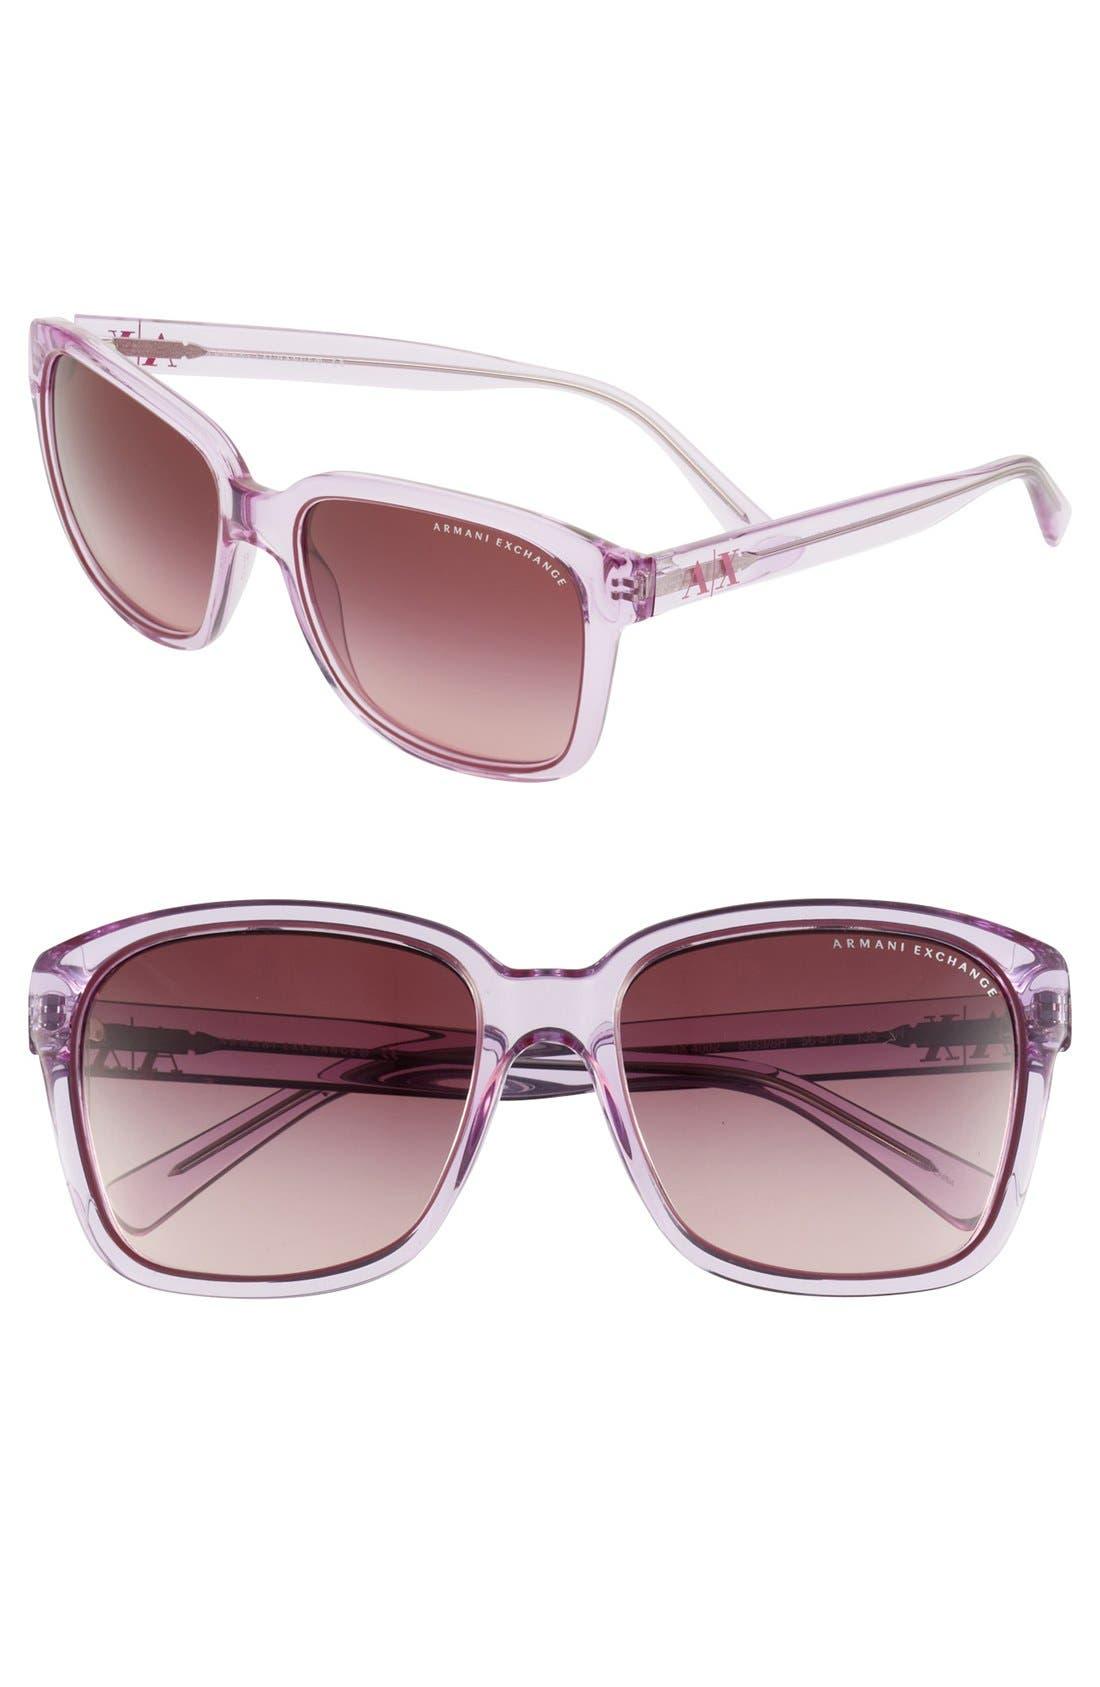 Main Image - AX Armani Exchange 56mm Sunglasses